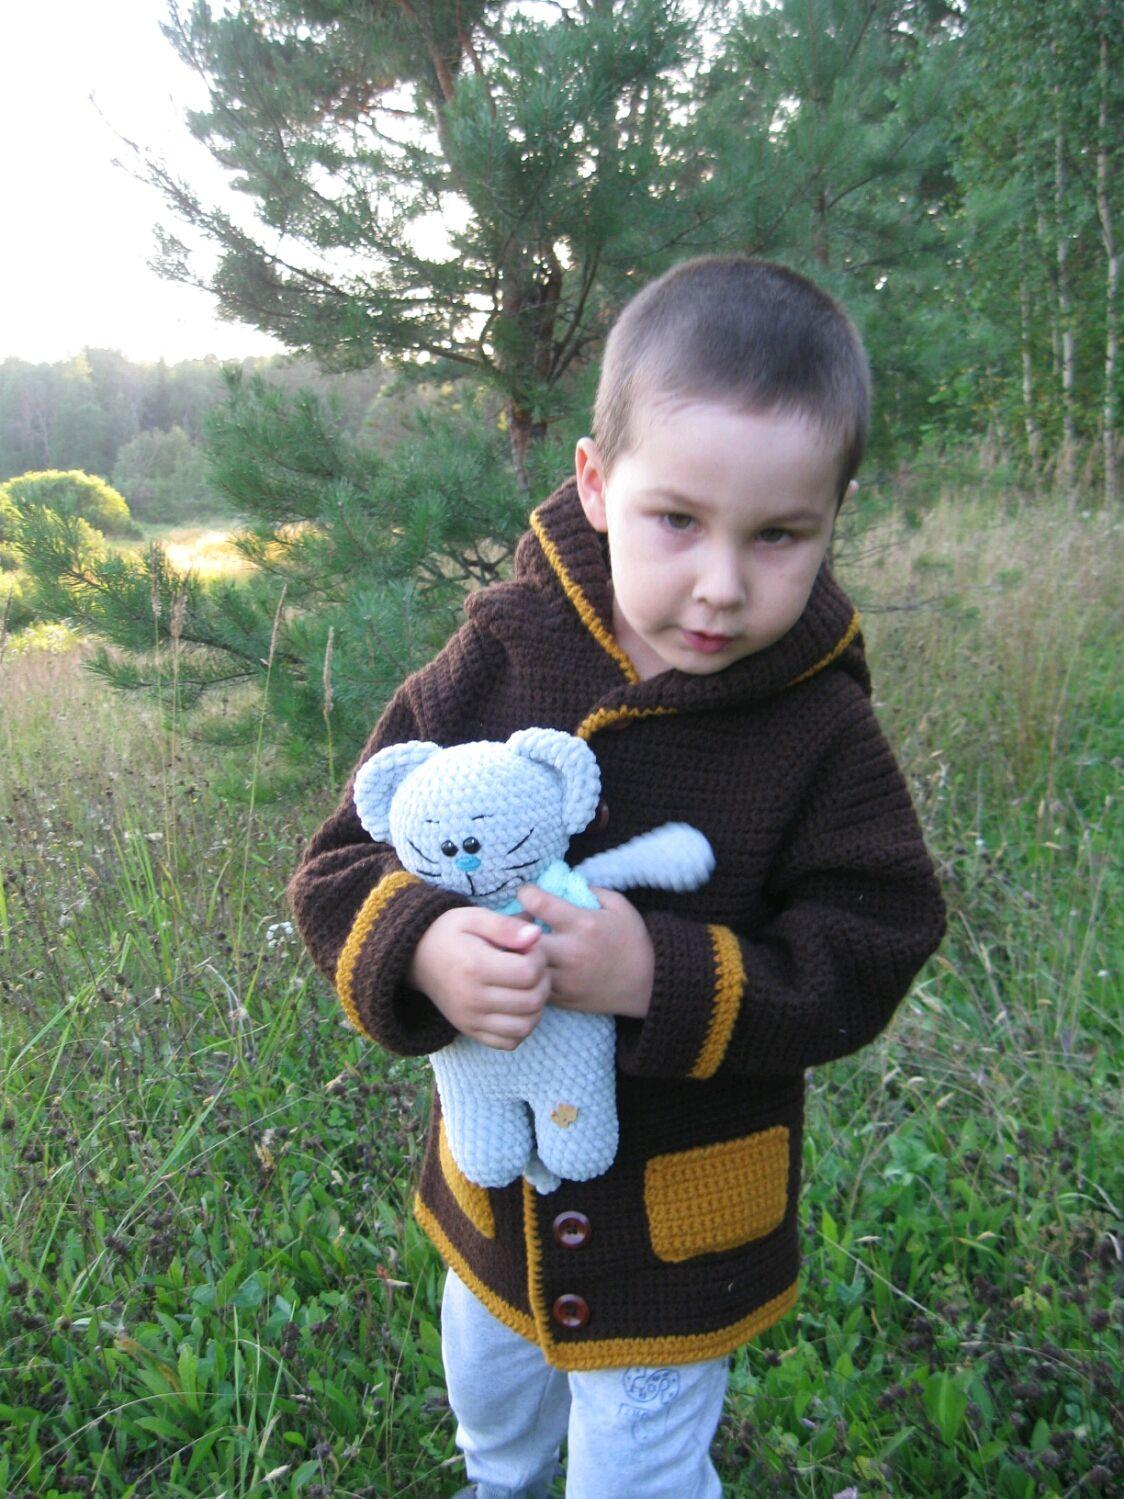 Кардиган на мальчика 4-5 лет в наличии, Одежда, Йошкар-Ола, Фото №1